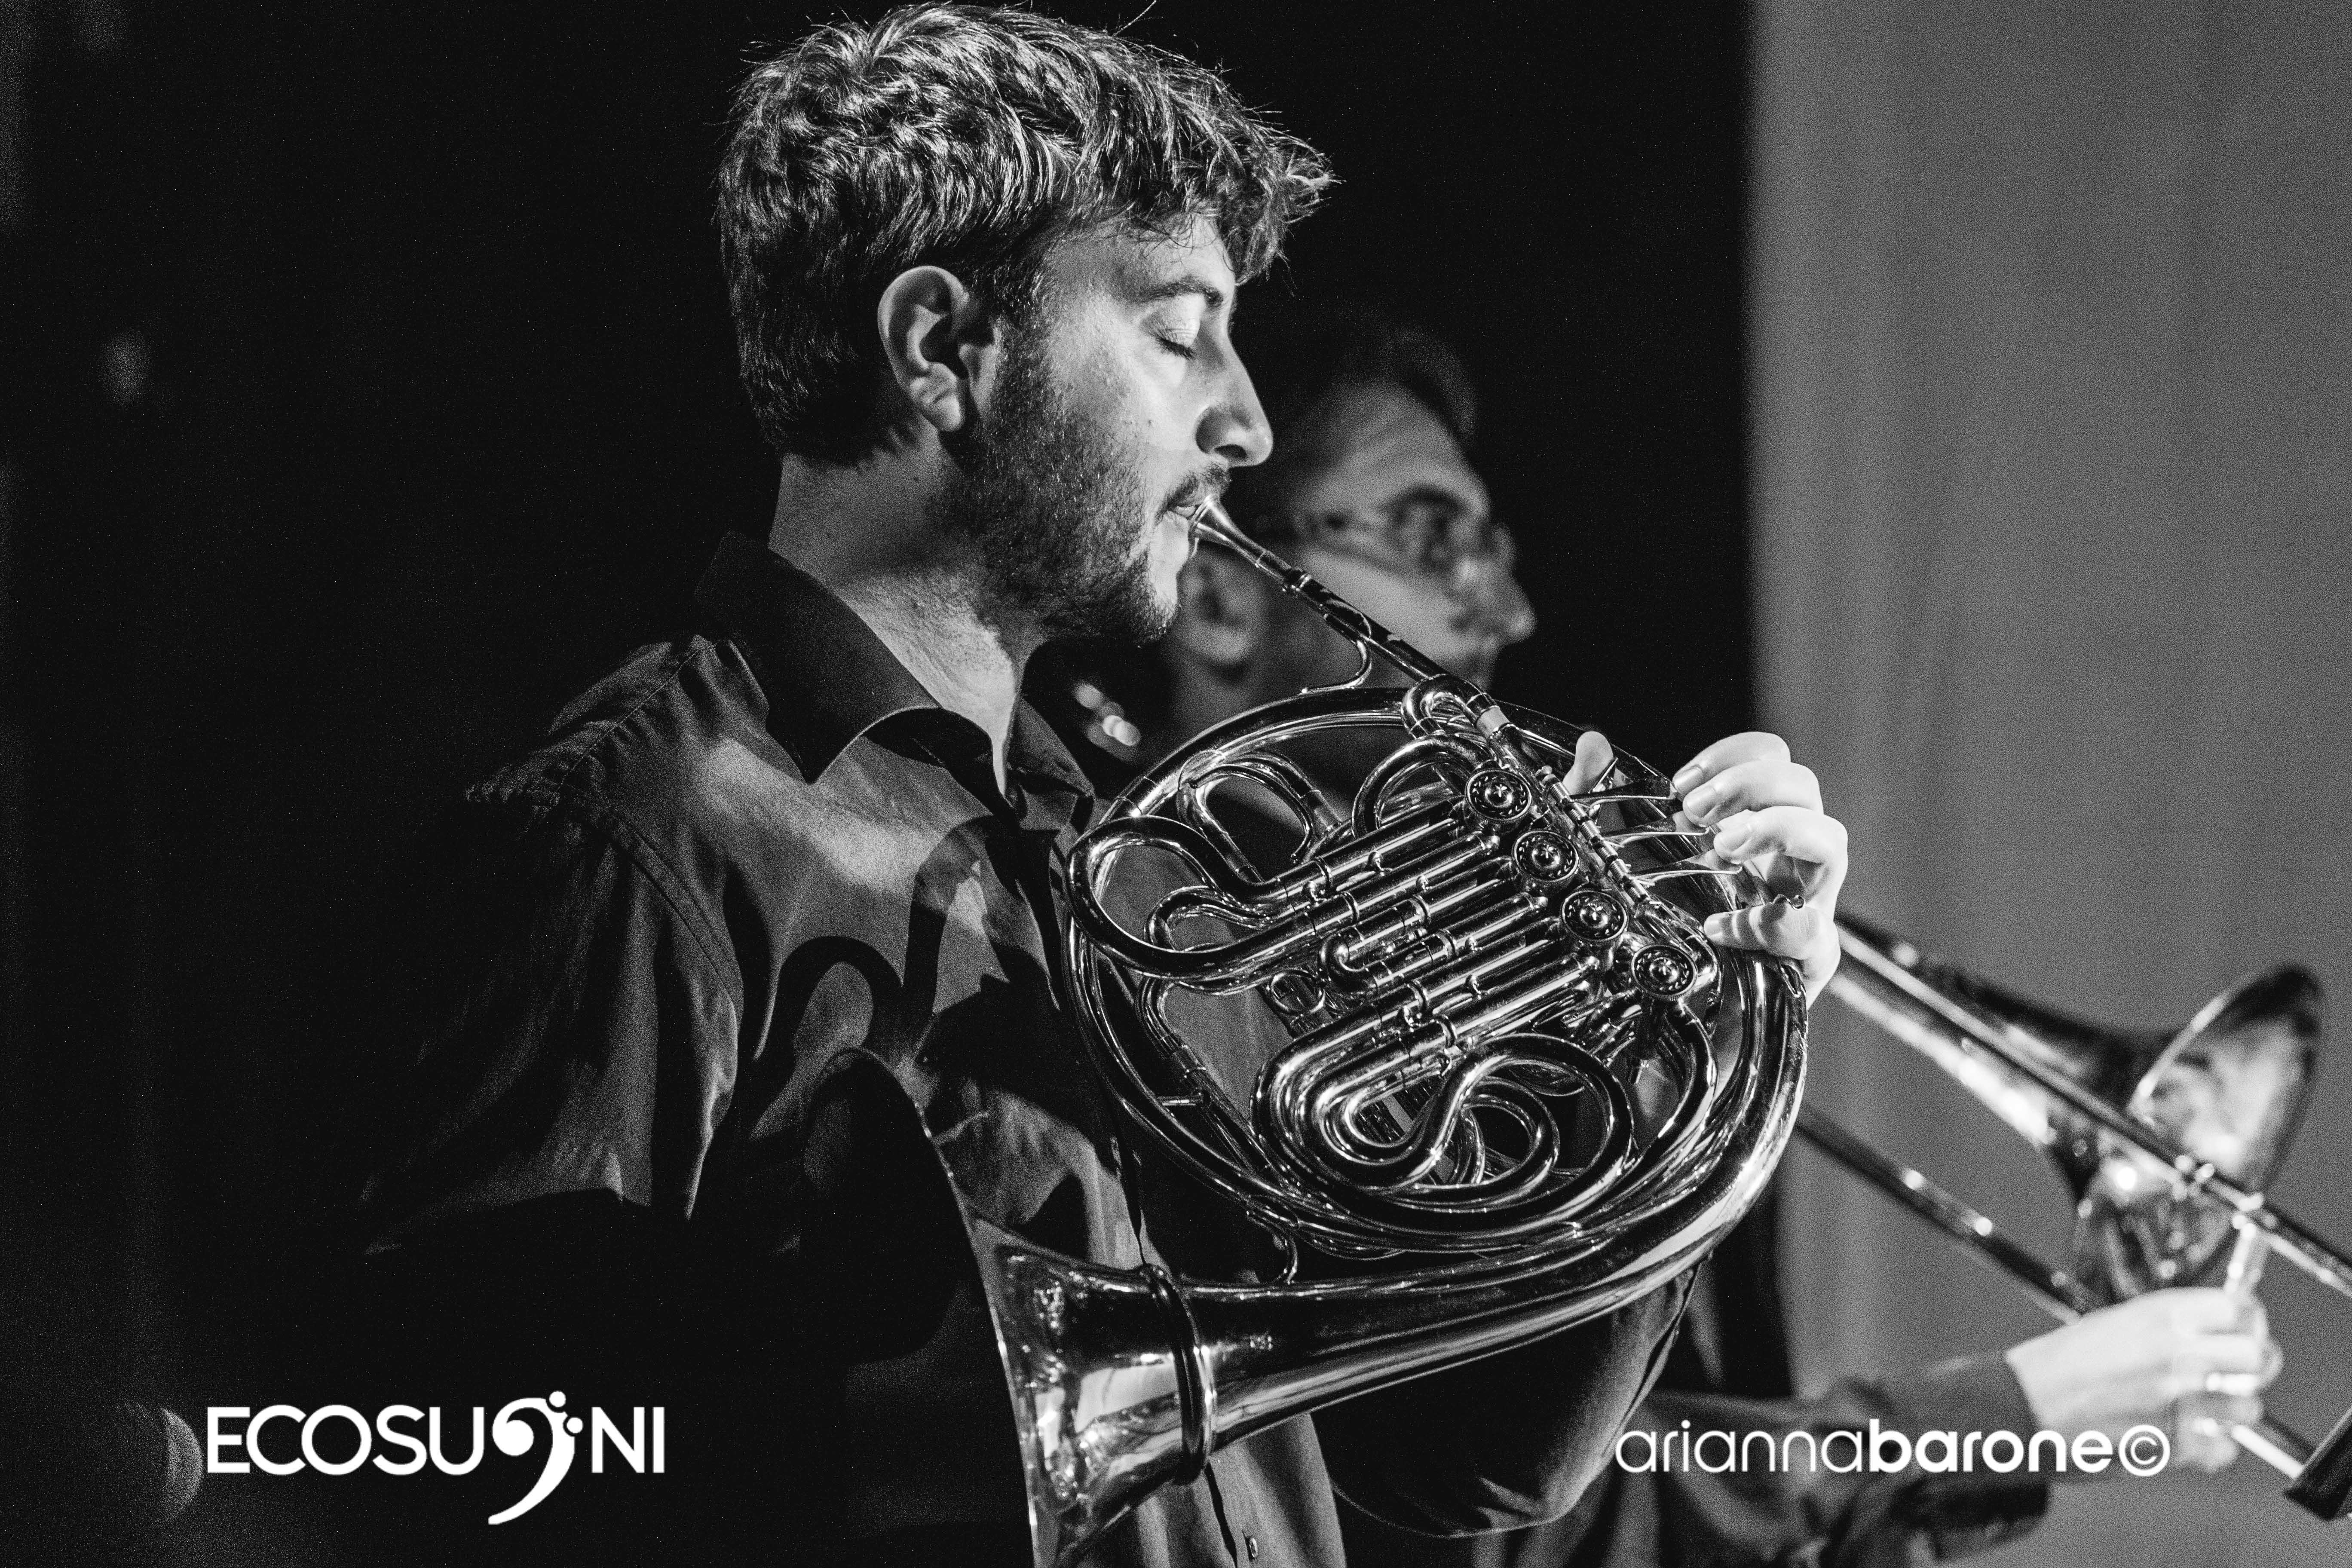 Ecosuoni - Terracina 2019 - 5